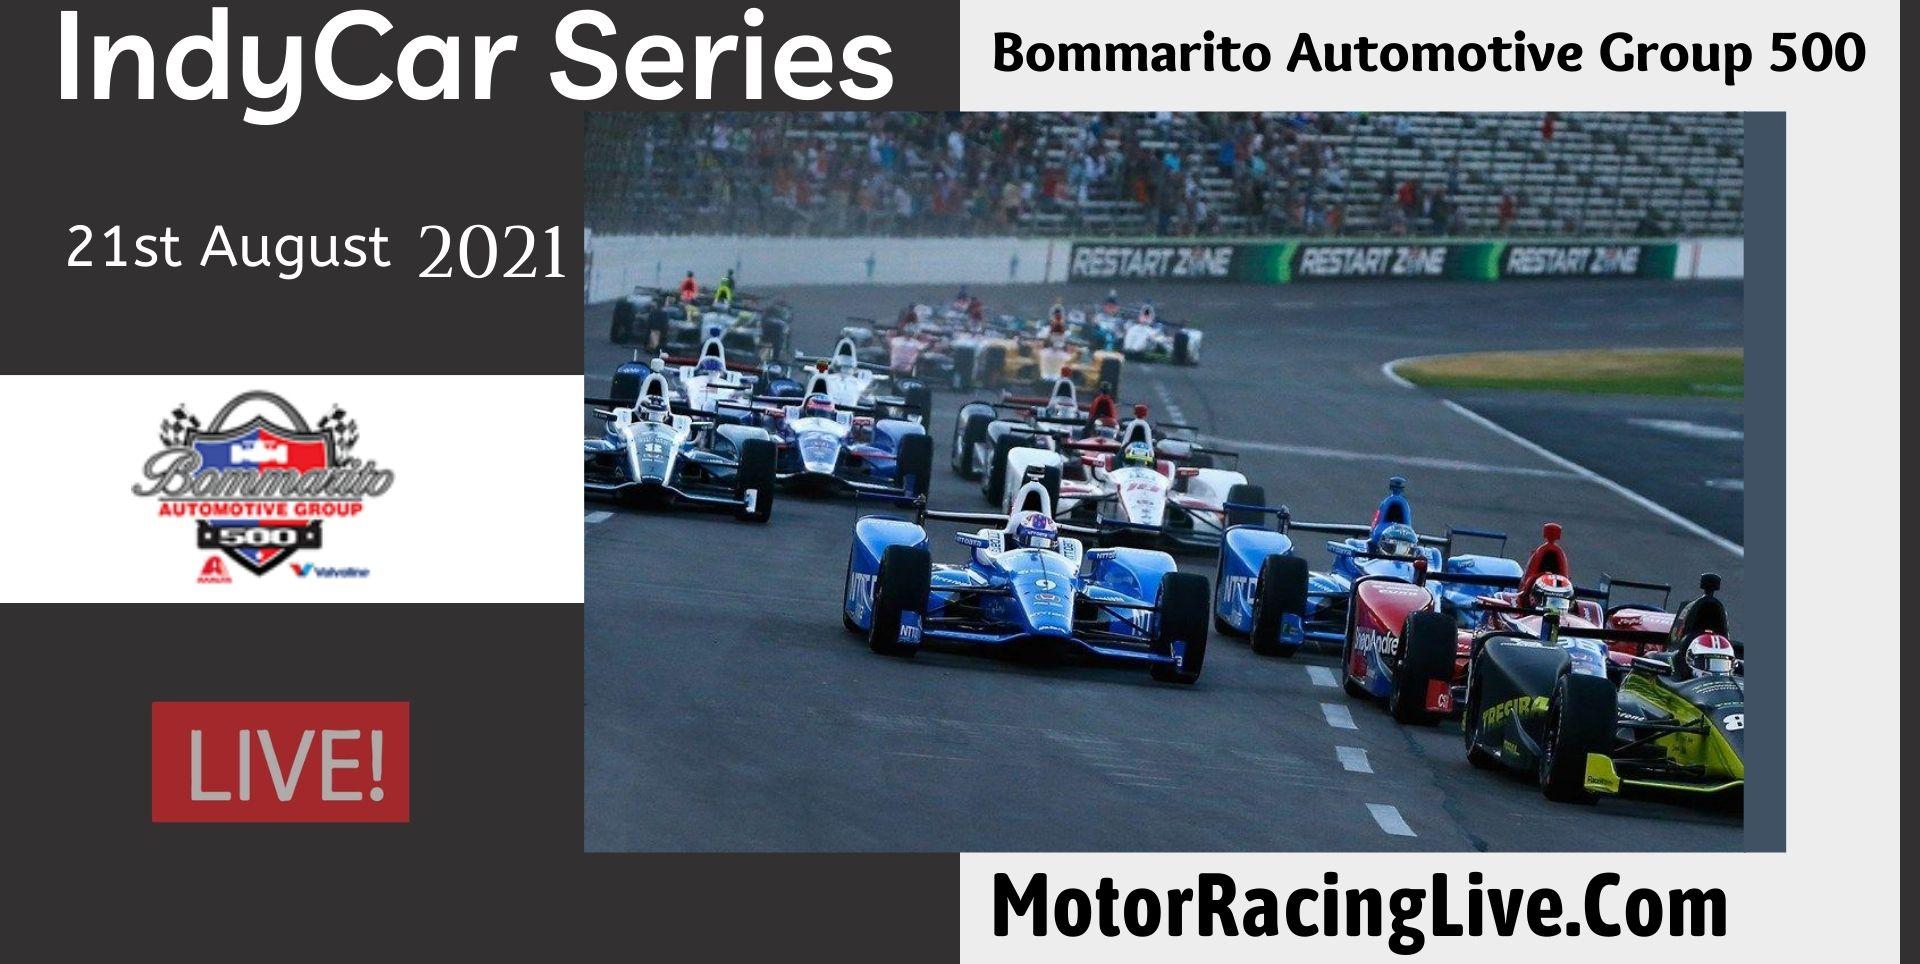 Bommarito Automotive Group 500 Live Stream 2021 | Indycar